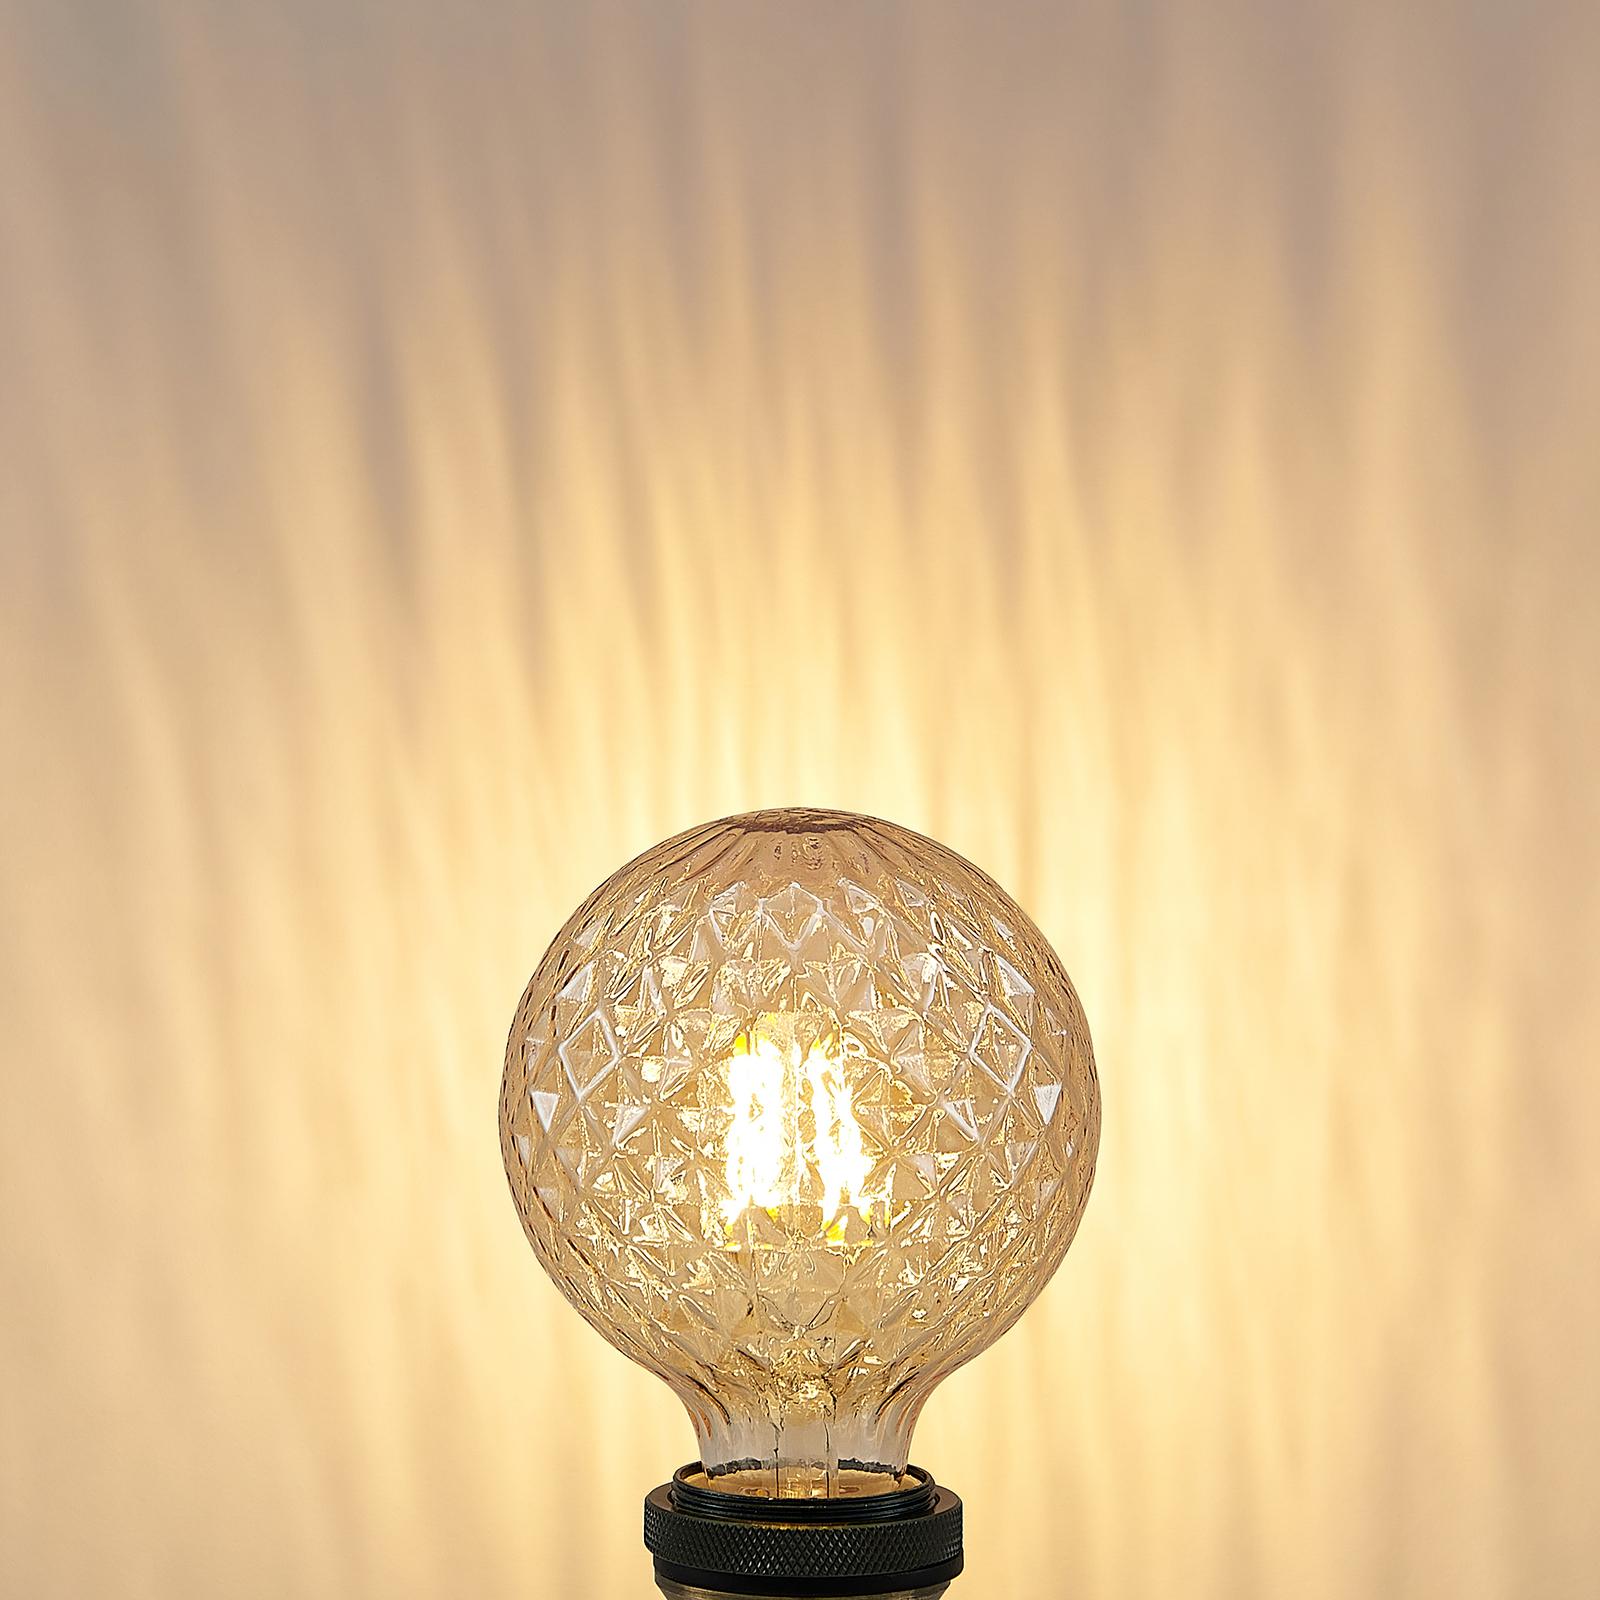 Lucande-LED-lamppu E27 G95 4W 2700K meripihka